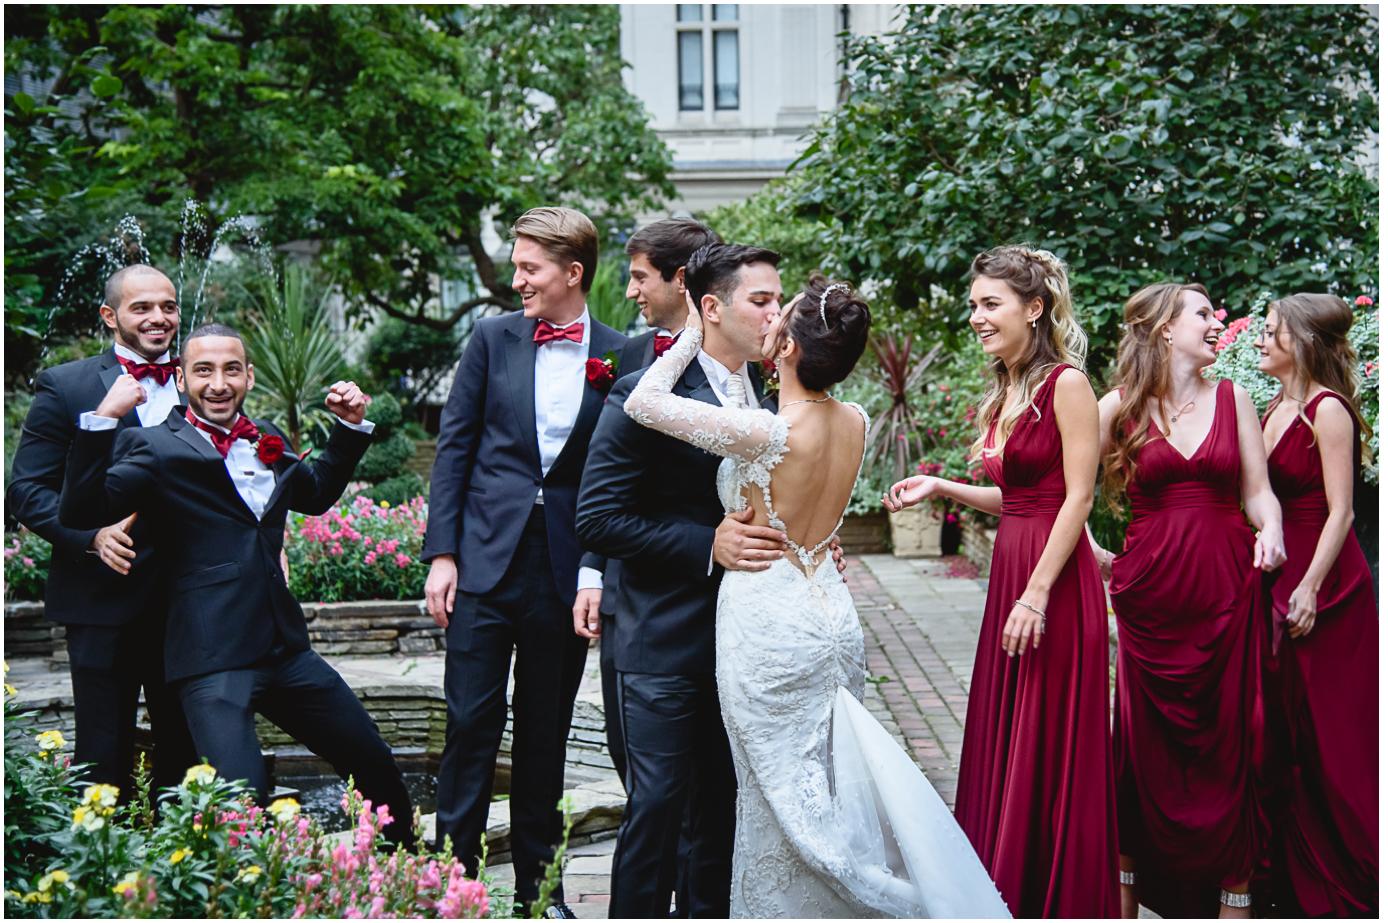 iranian wedding photographer 187 - Drapers Hall London Wedding Photographer